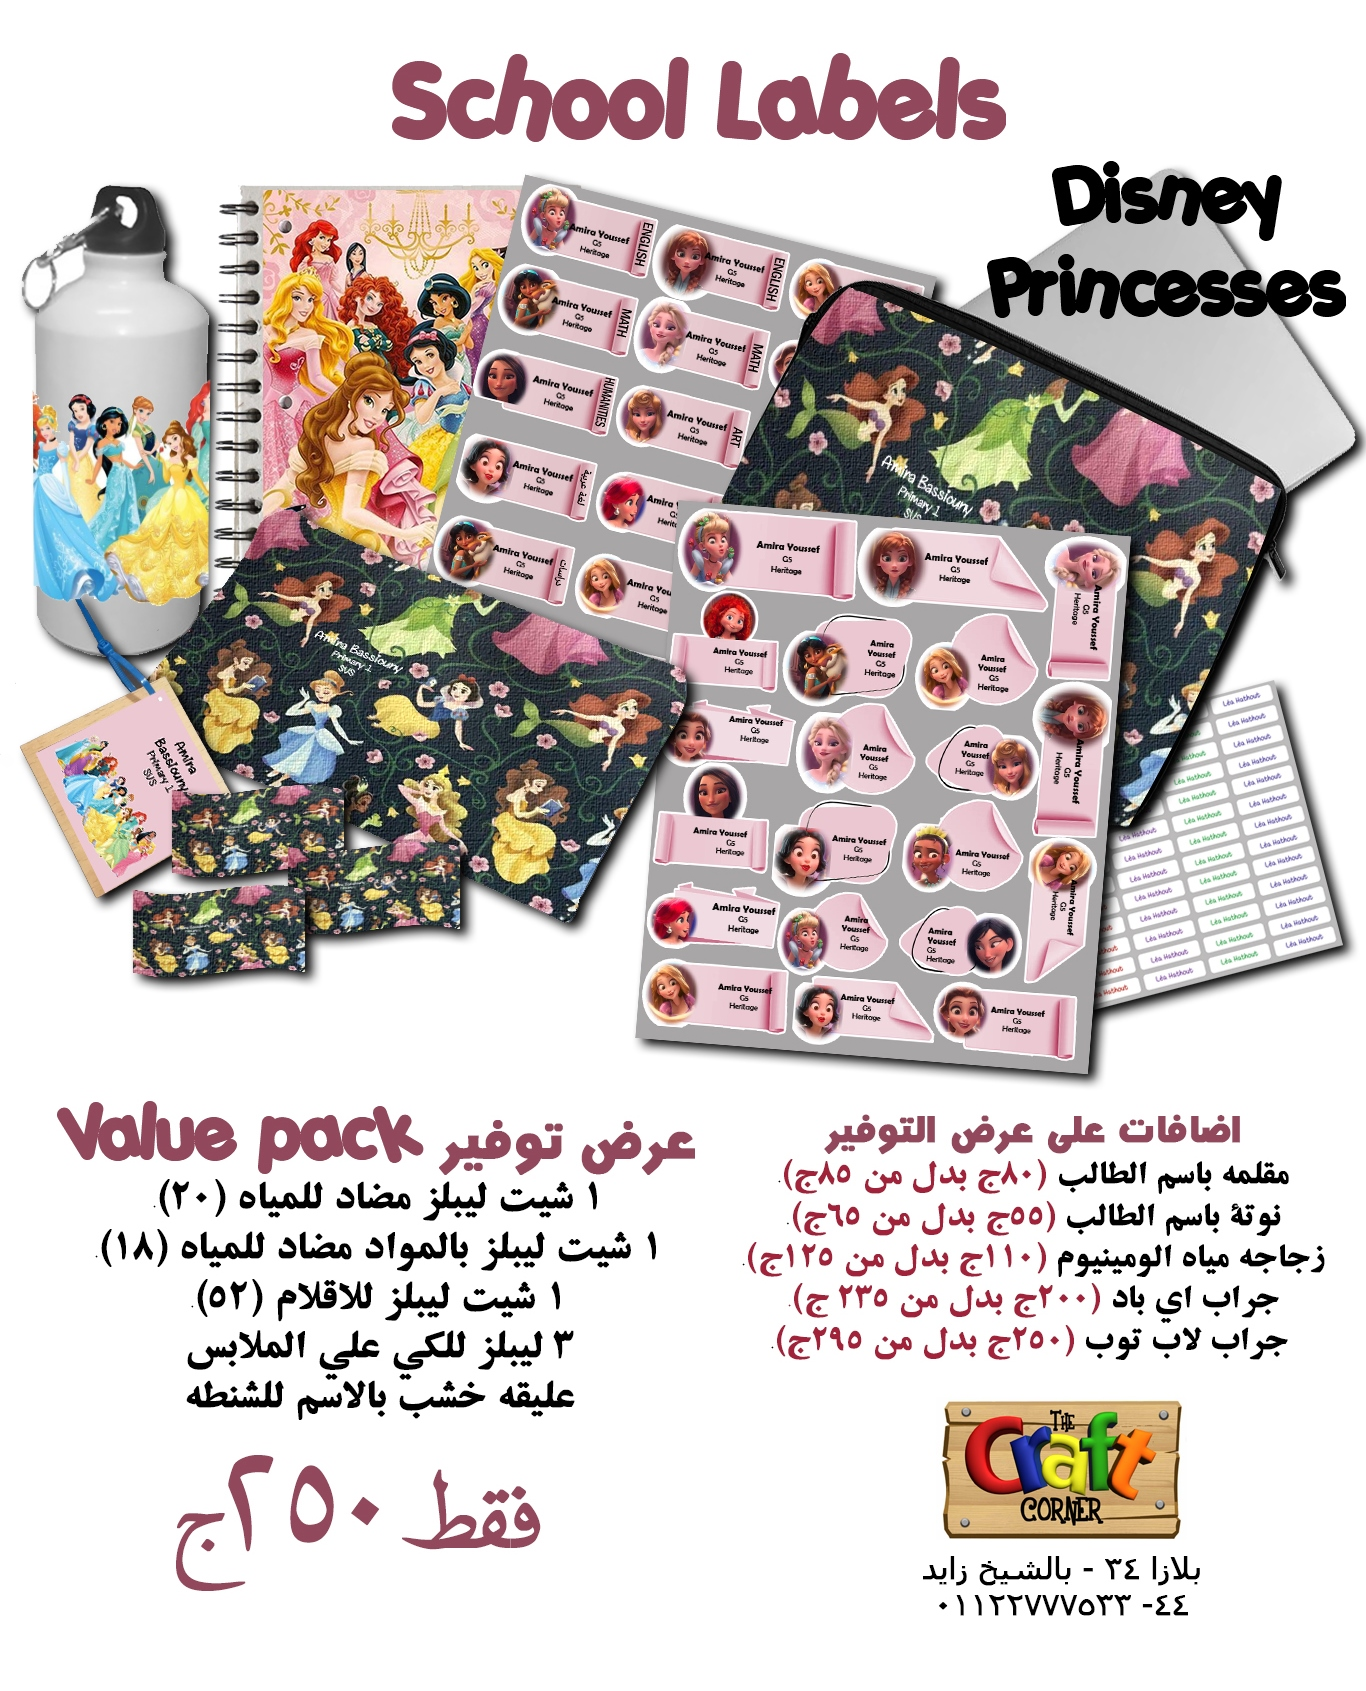 Disney princesses ad arabic